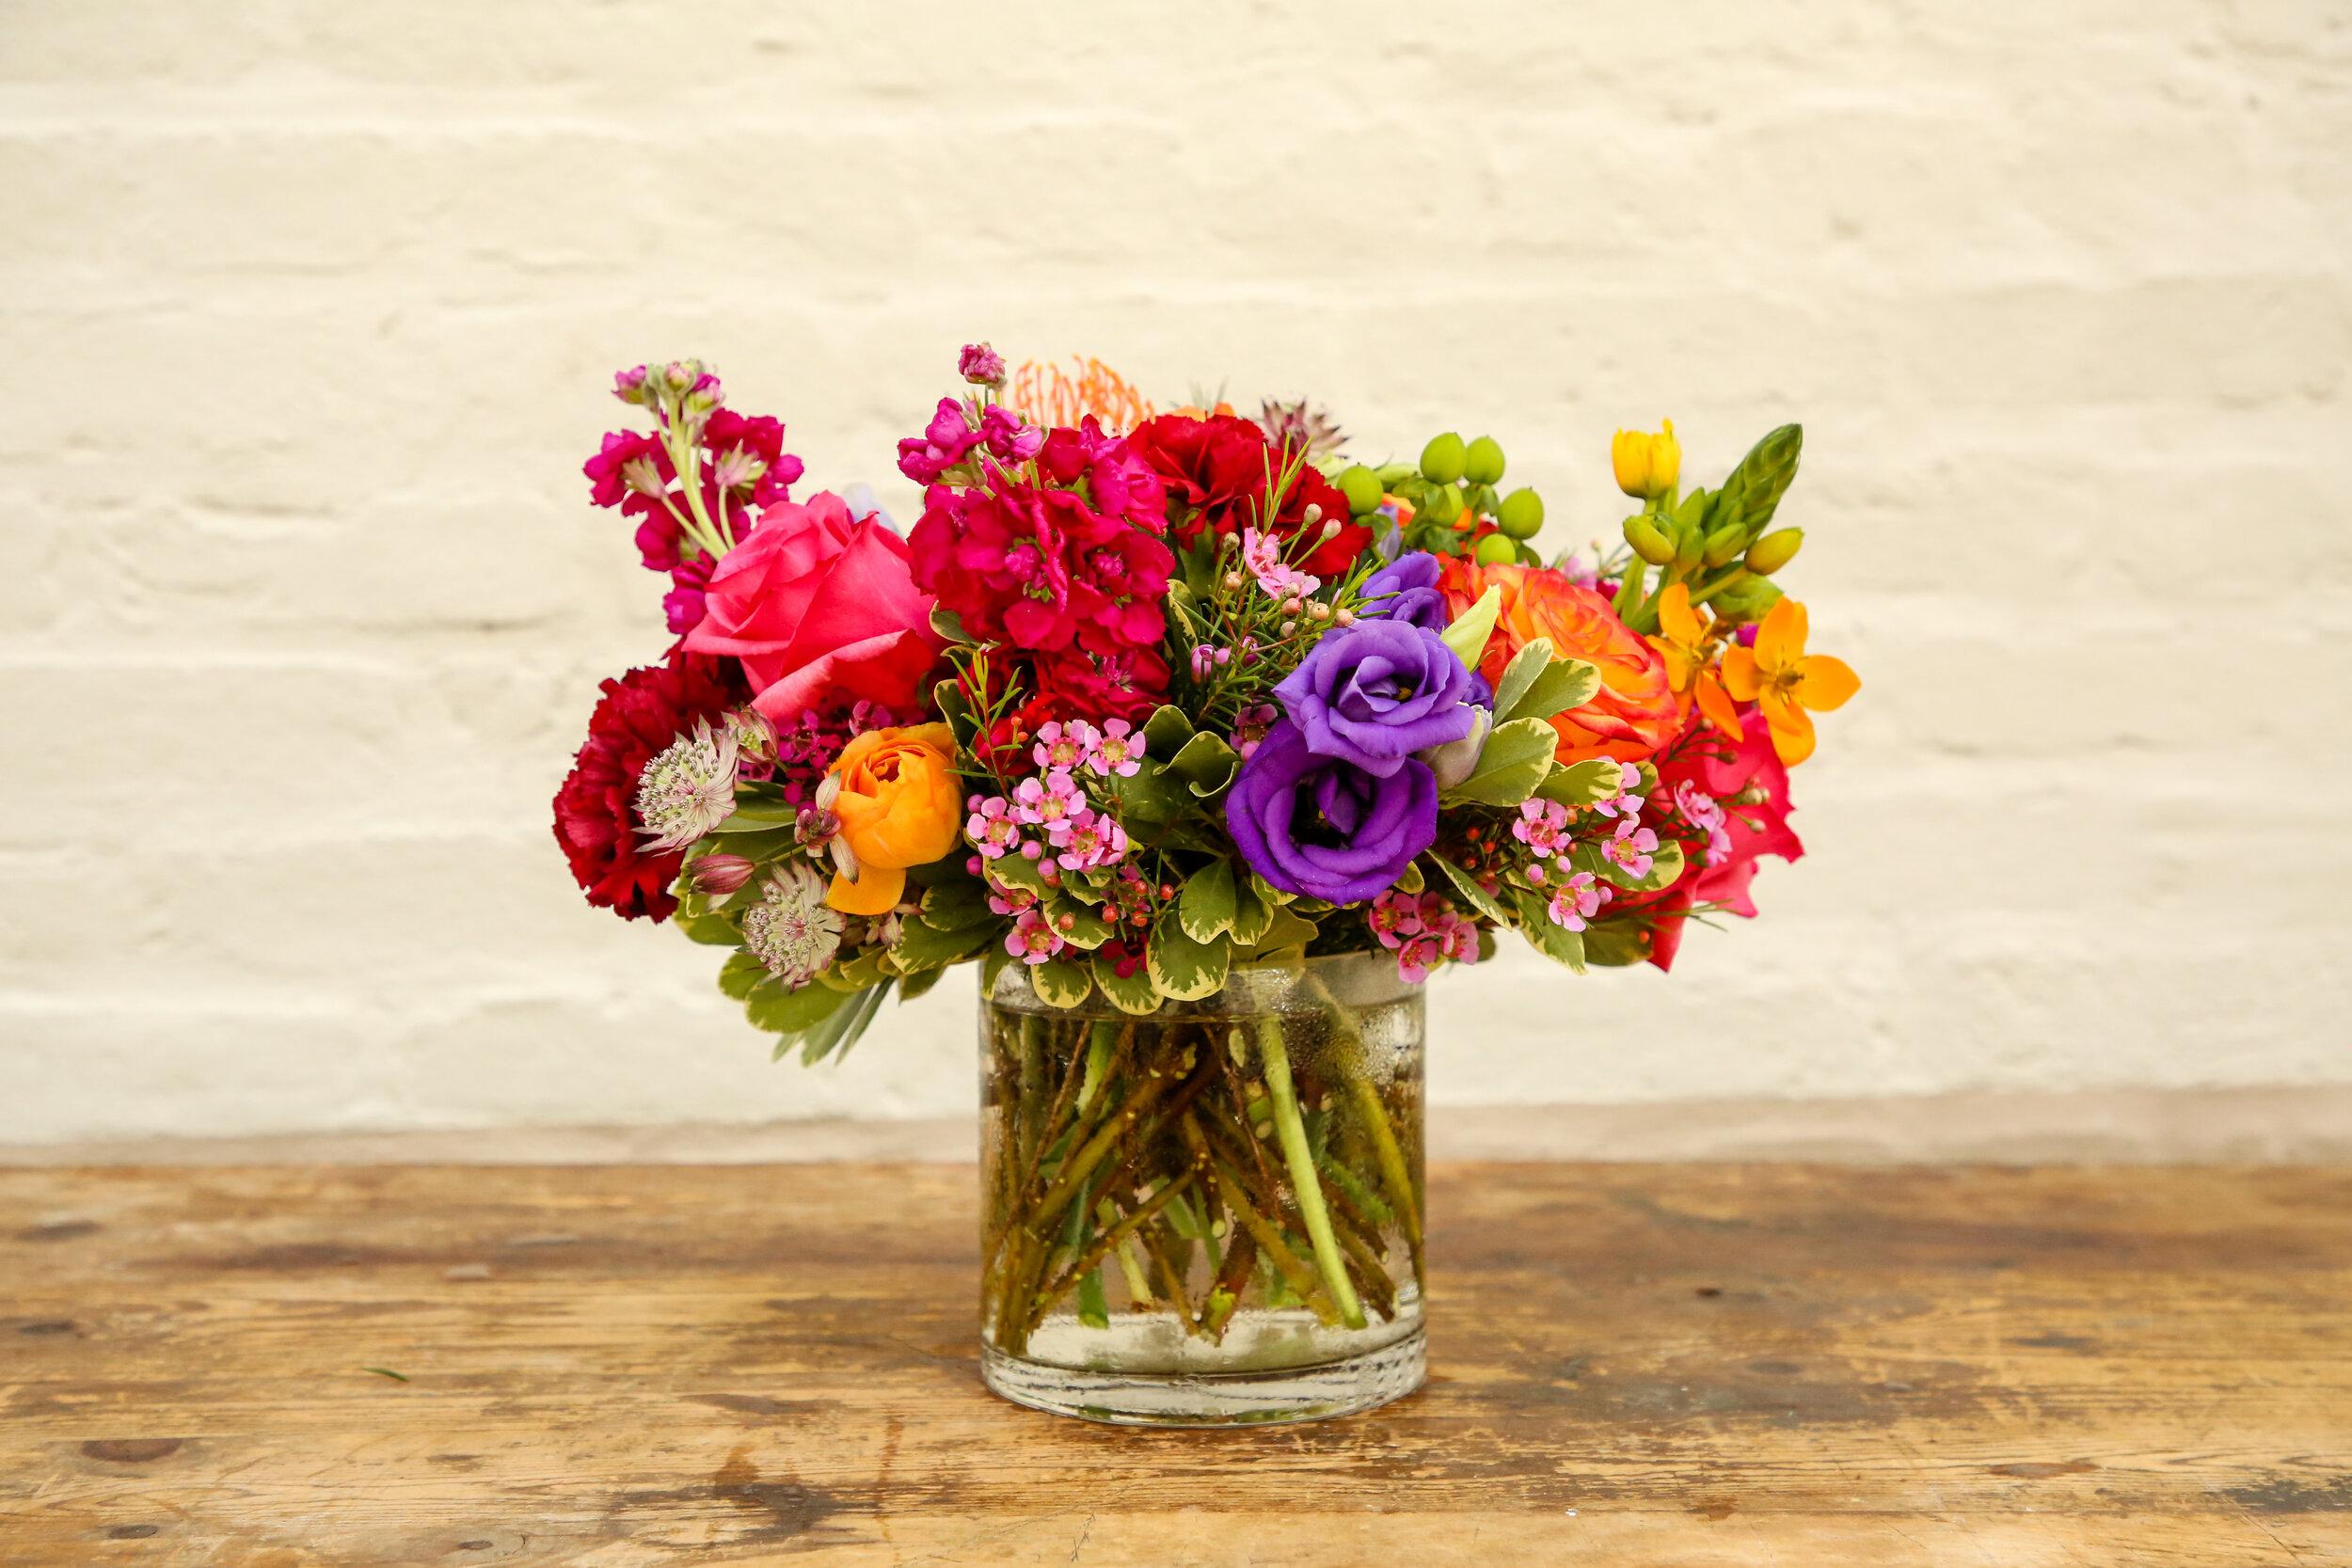 Palate_Flower+BarShoot_Aug282019-21.jpg